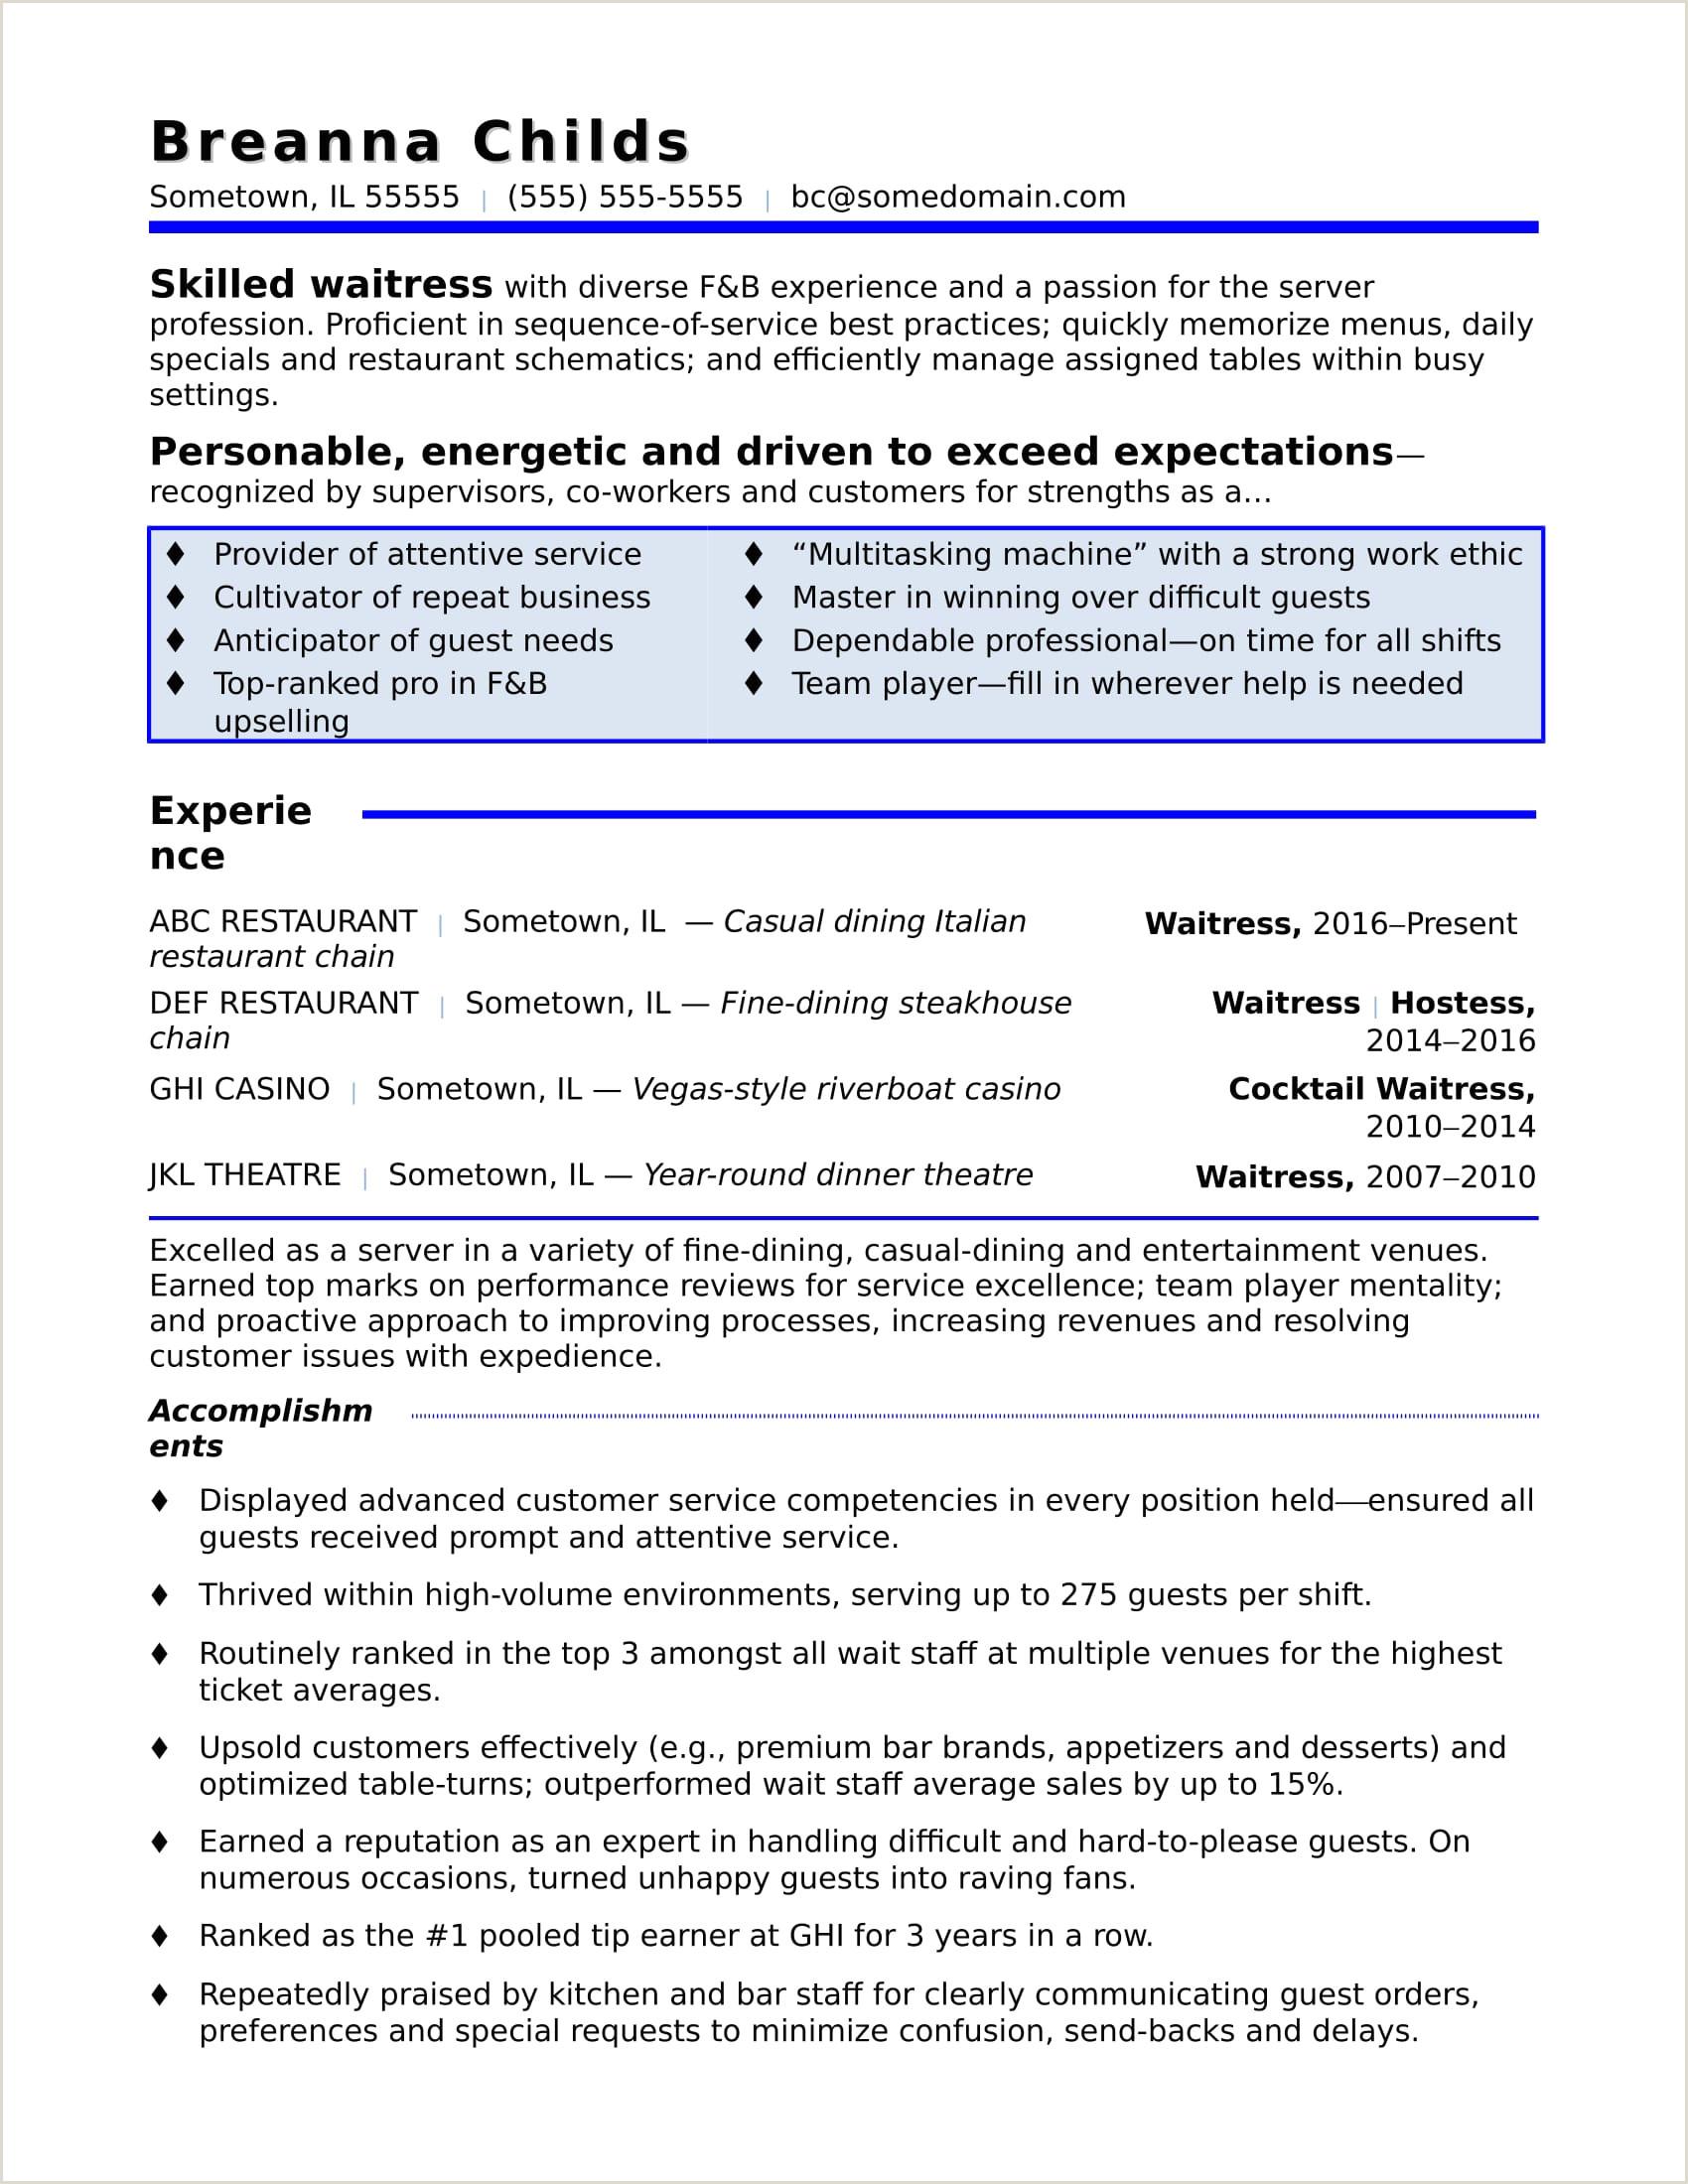 Cv format for Job Abroad Waitress Resume Sample